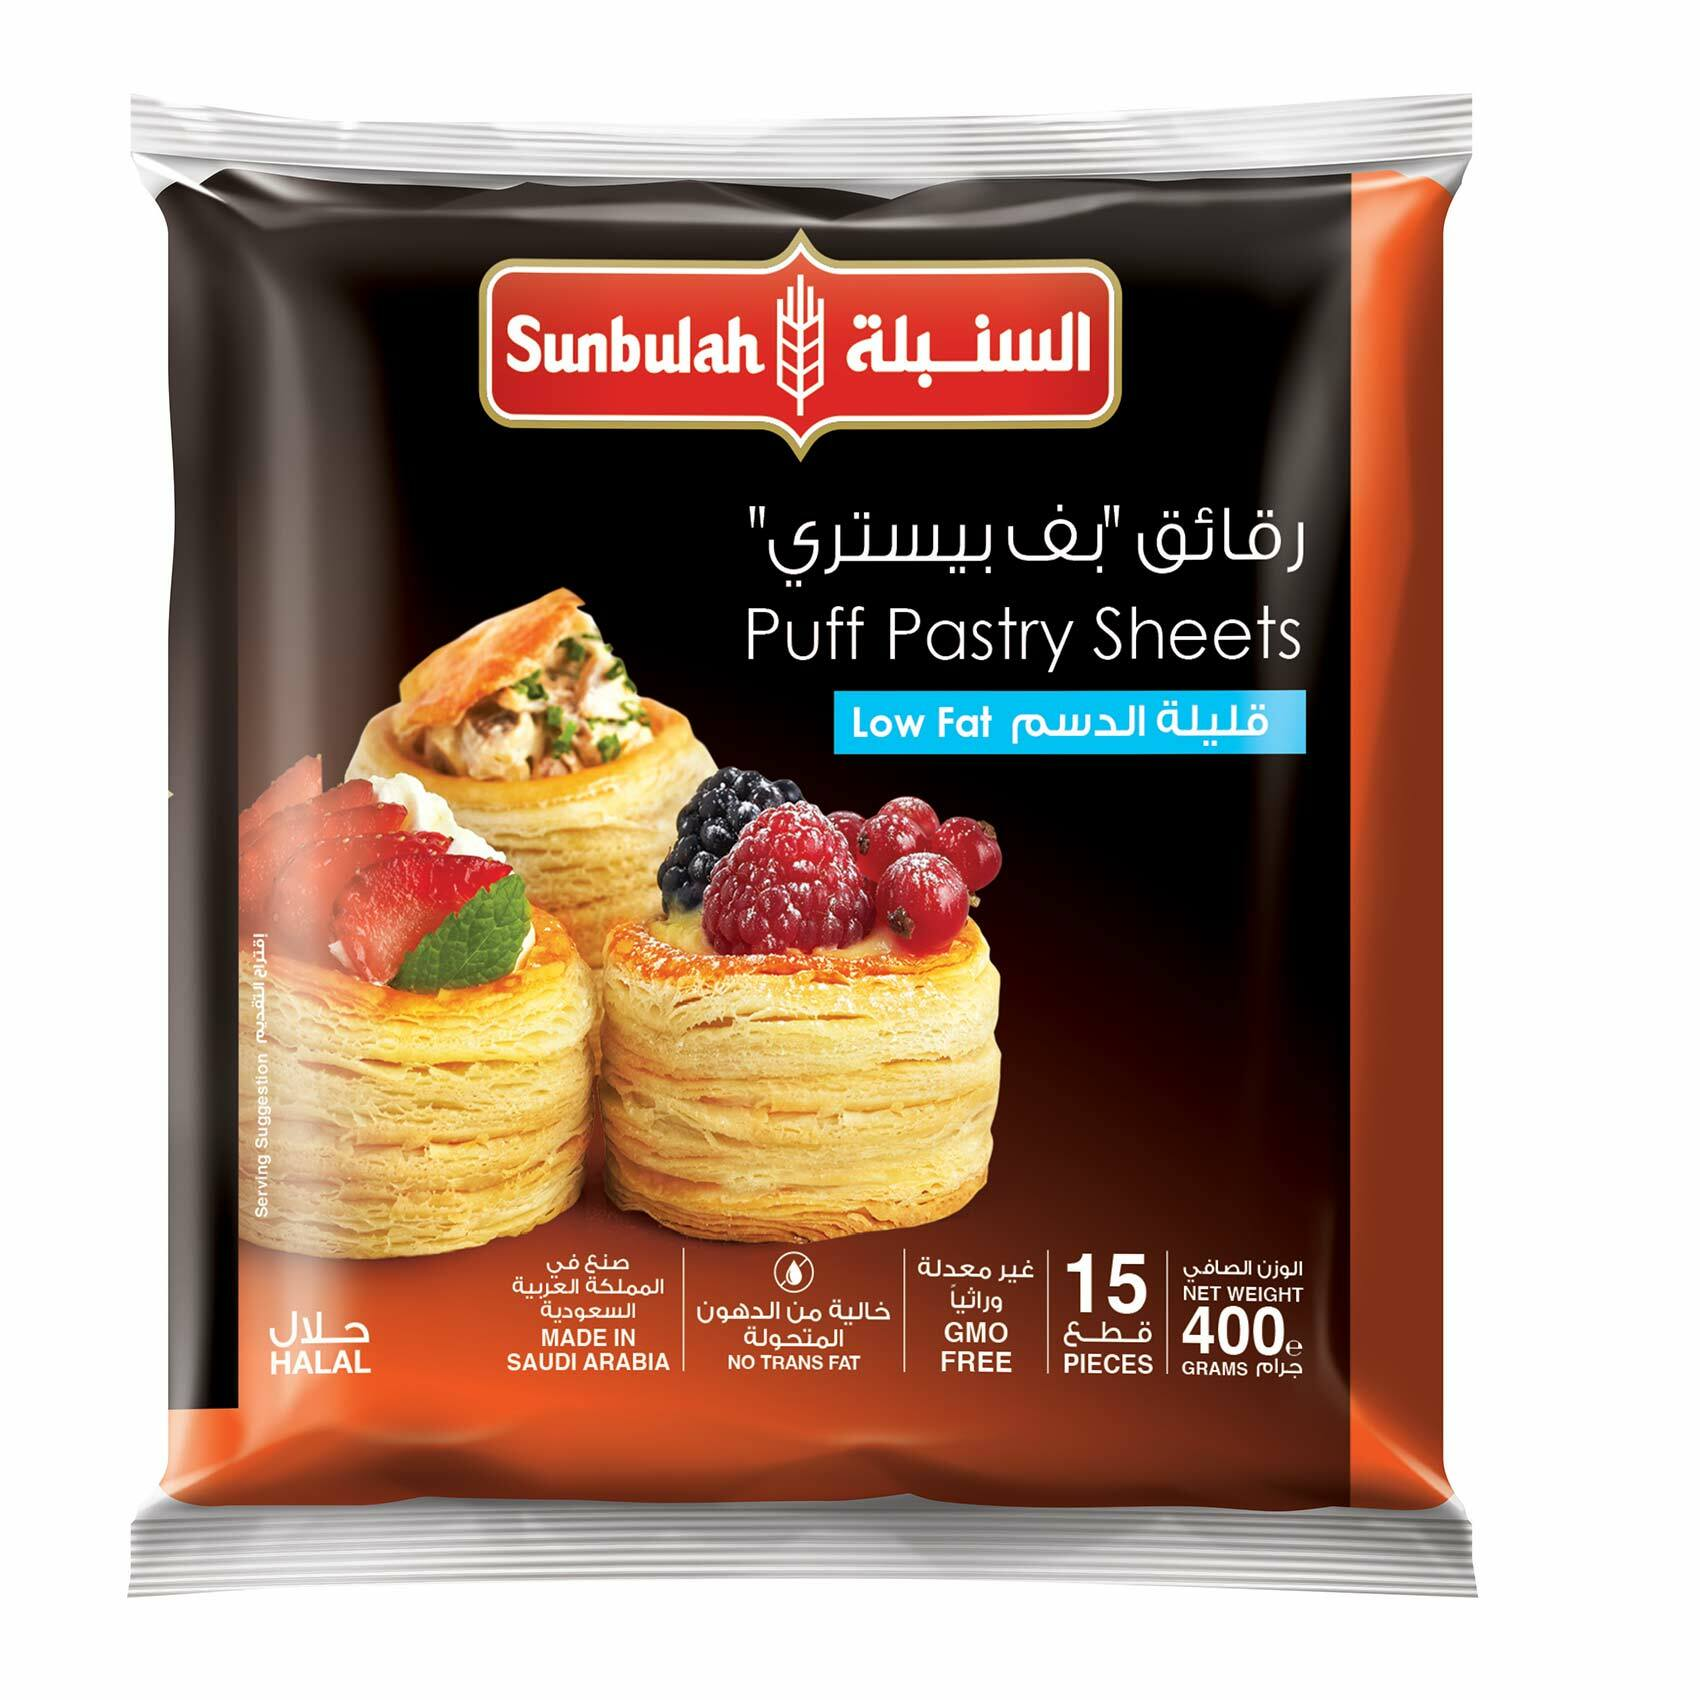 Buy Sunbulah Puff Pastry Square Low Fat 400 G Online Shop Frozen Food On Carrefour Saudi Arabia